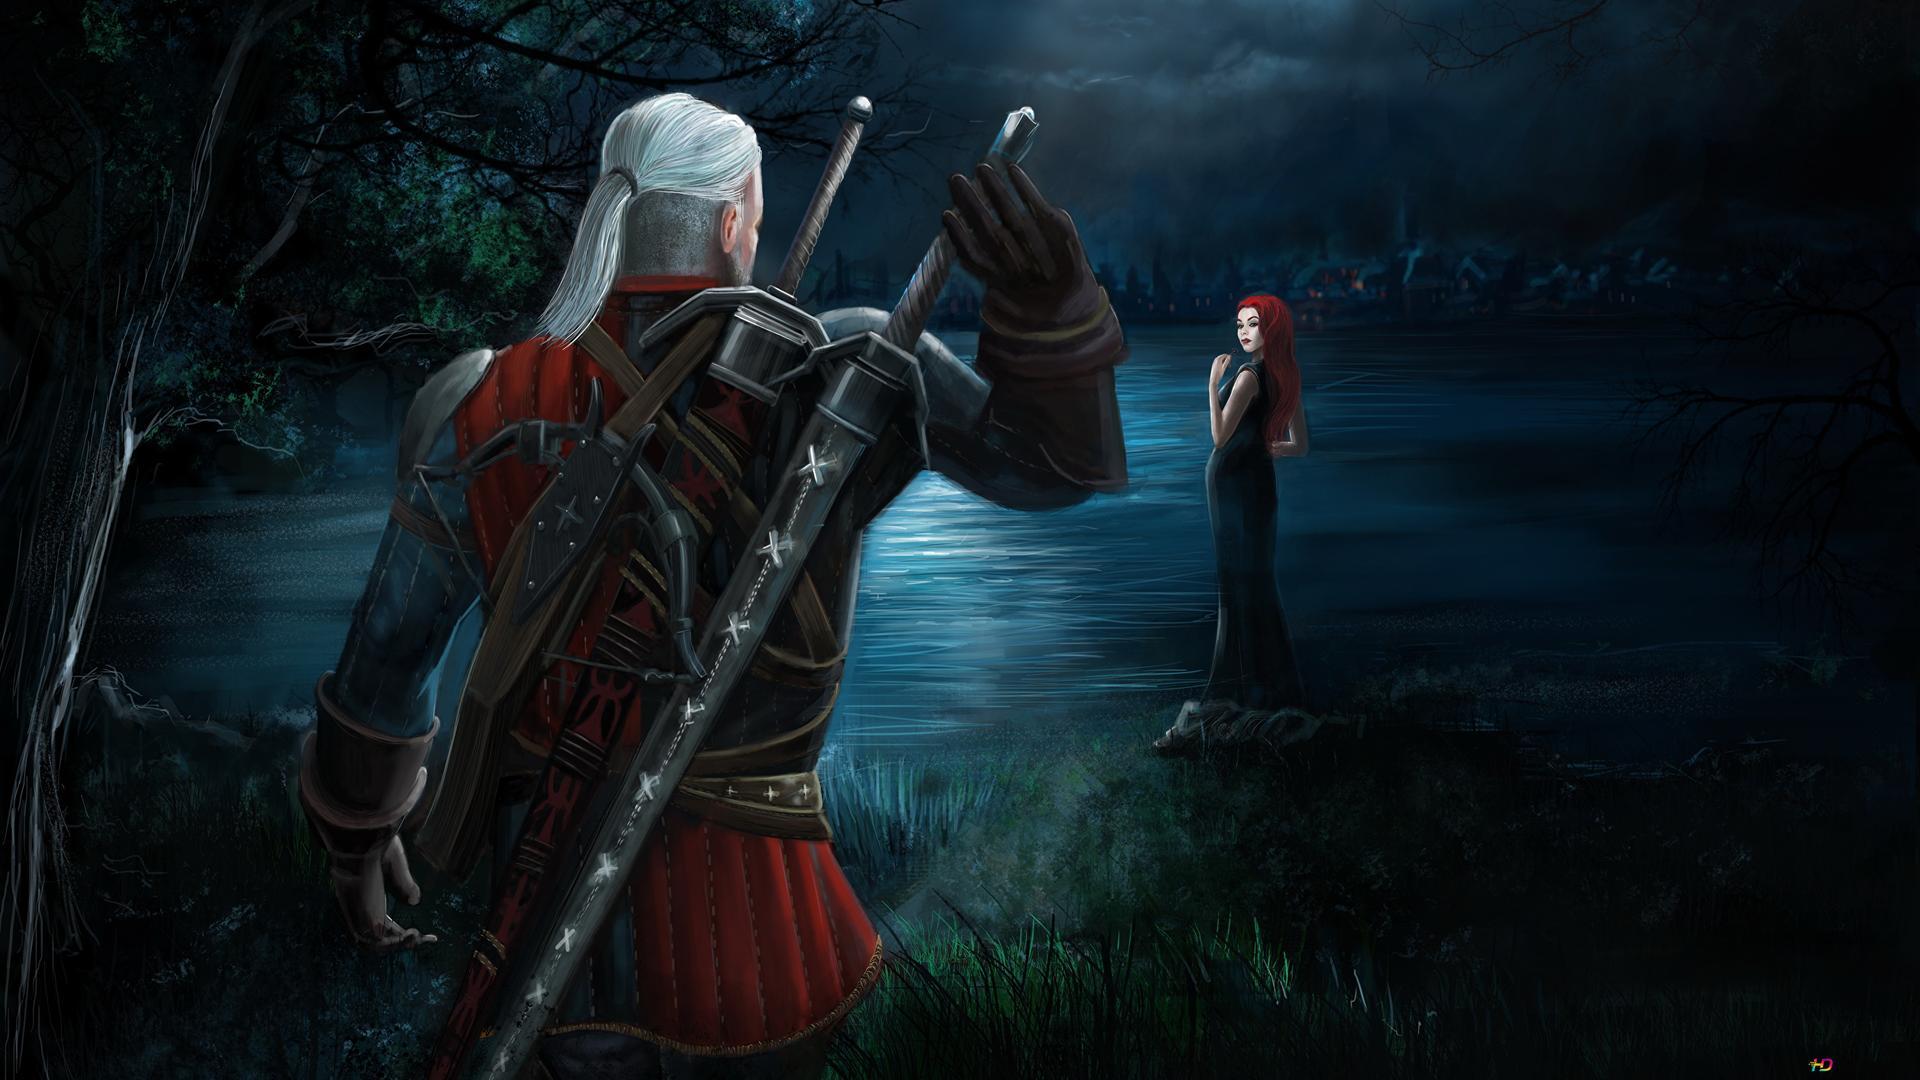 The Witcher 3 Wild Hunt Fanart Hd Wallpaper Download